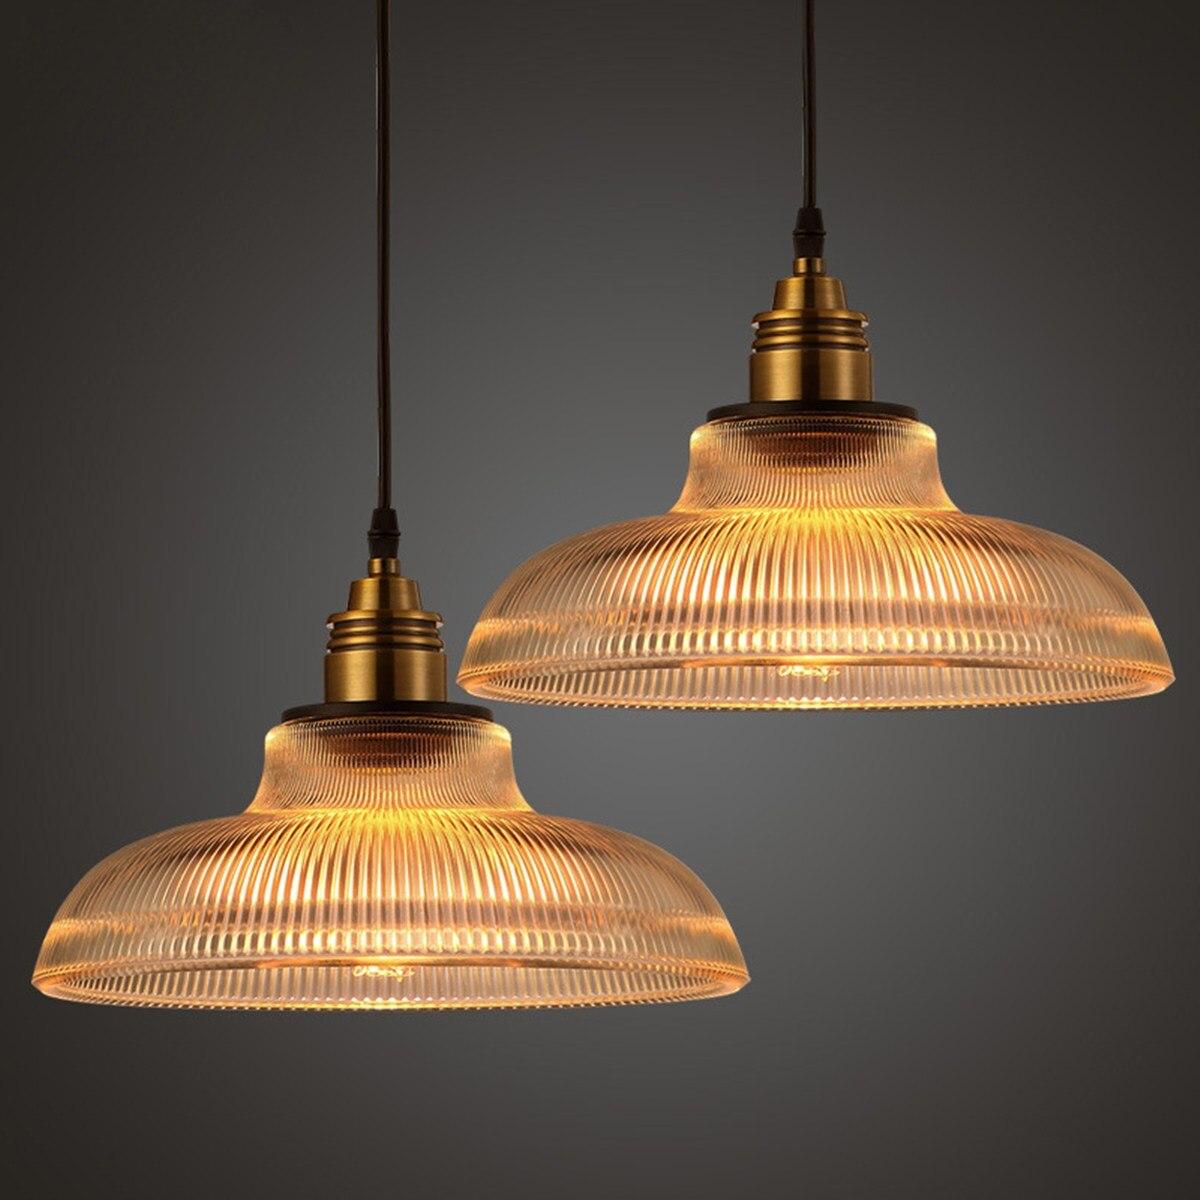 Antique Industrial Glass Pendant Light Vintage Retro Lamp Shade Cafe Bar зимние конверты супермамкет justcute сердца